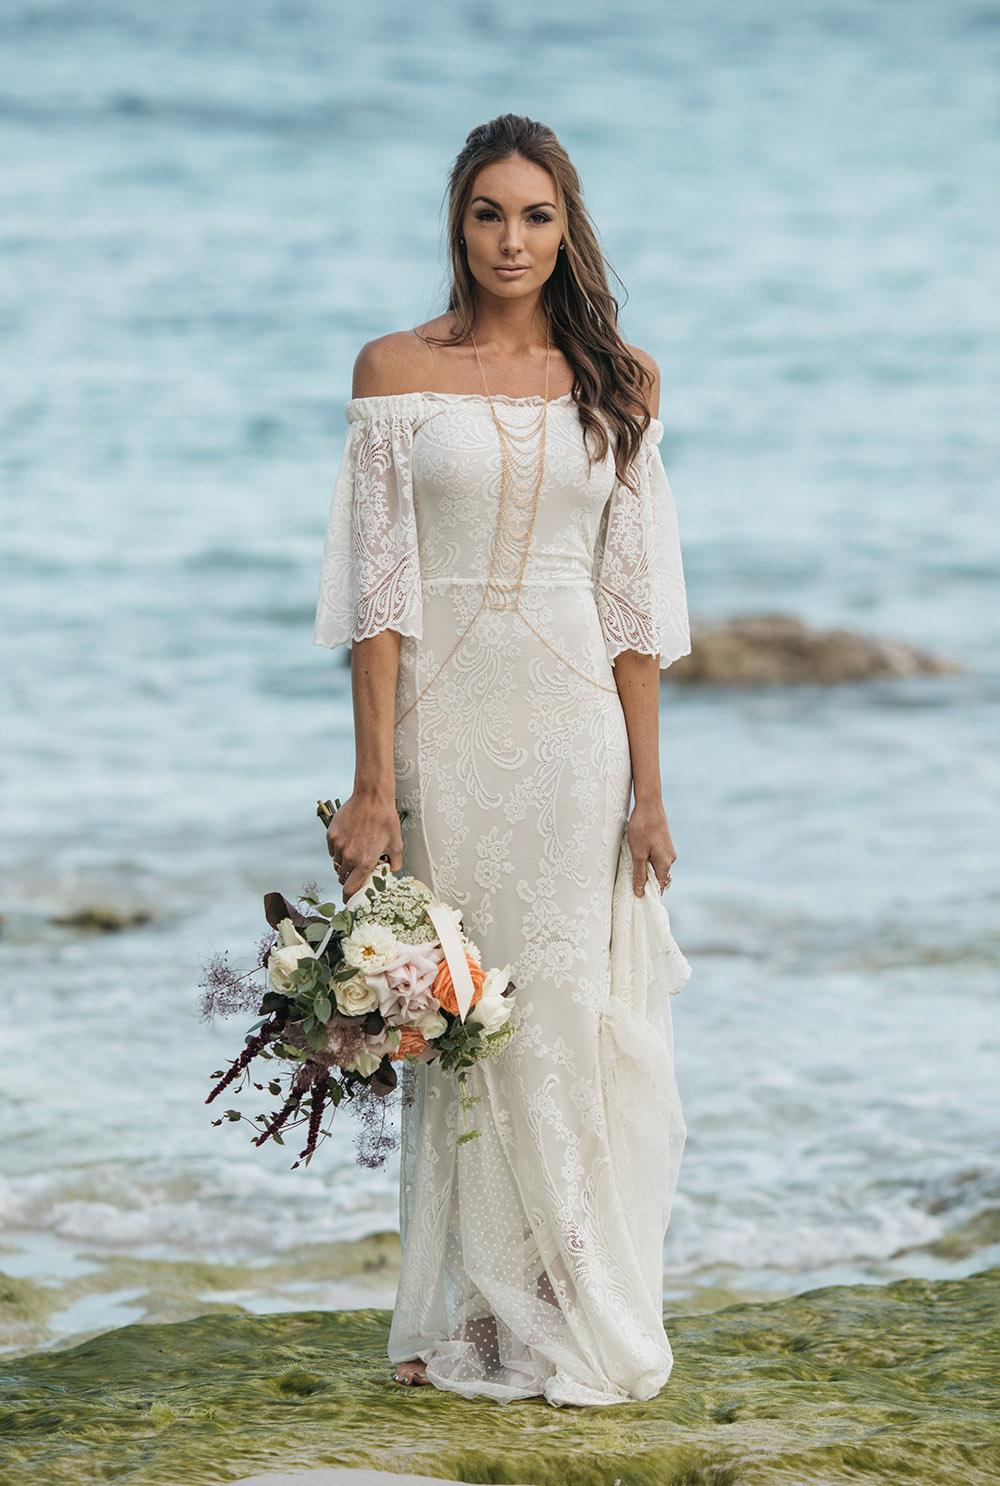 best wedding dresses for beach wedding photo - 1